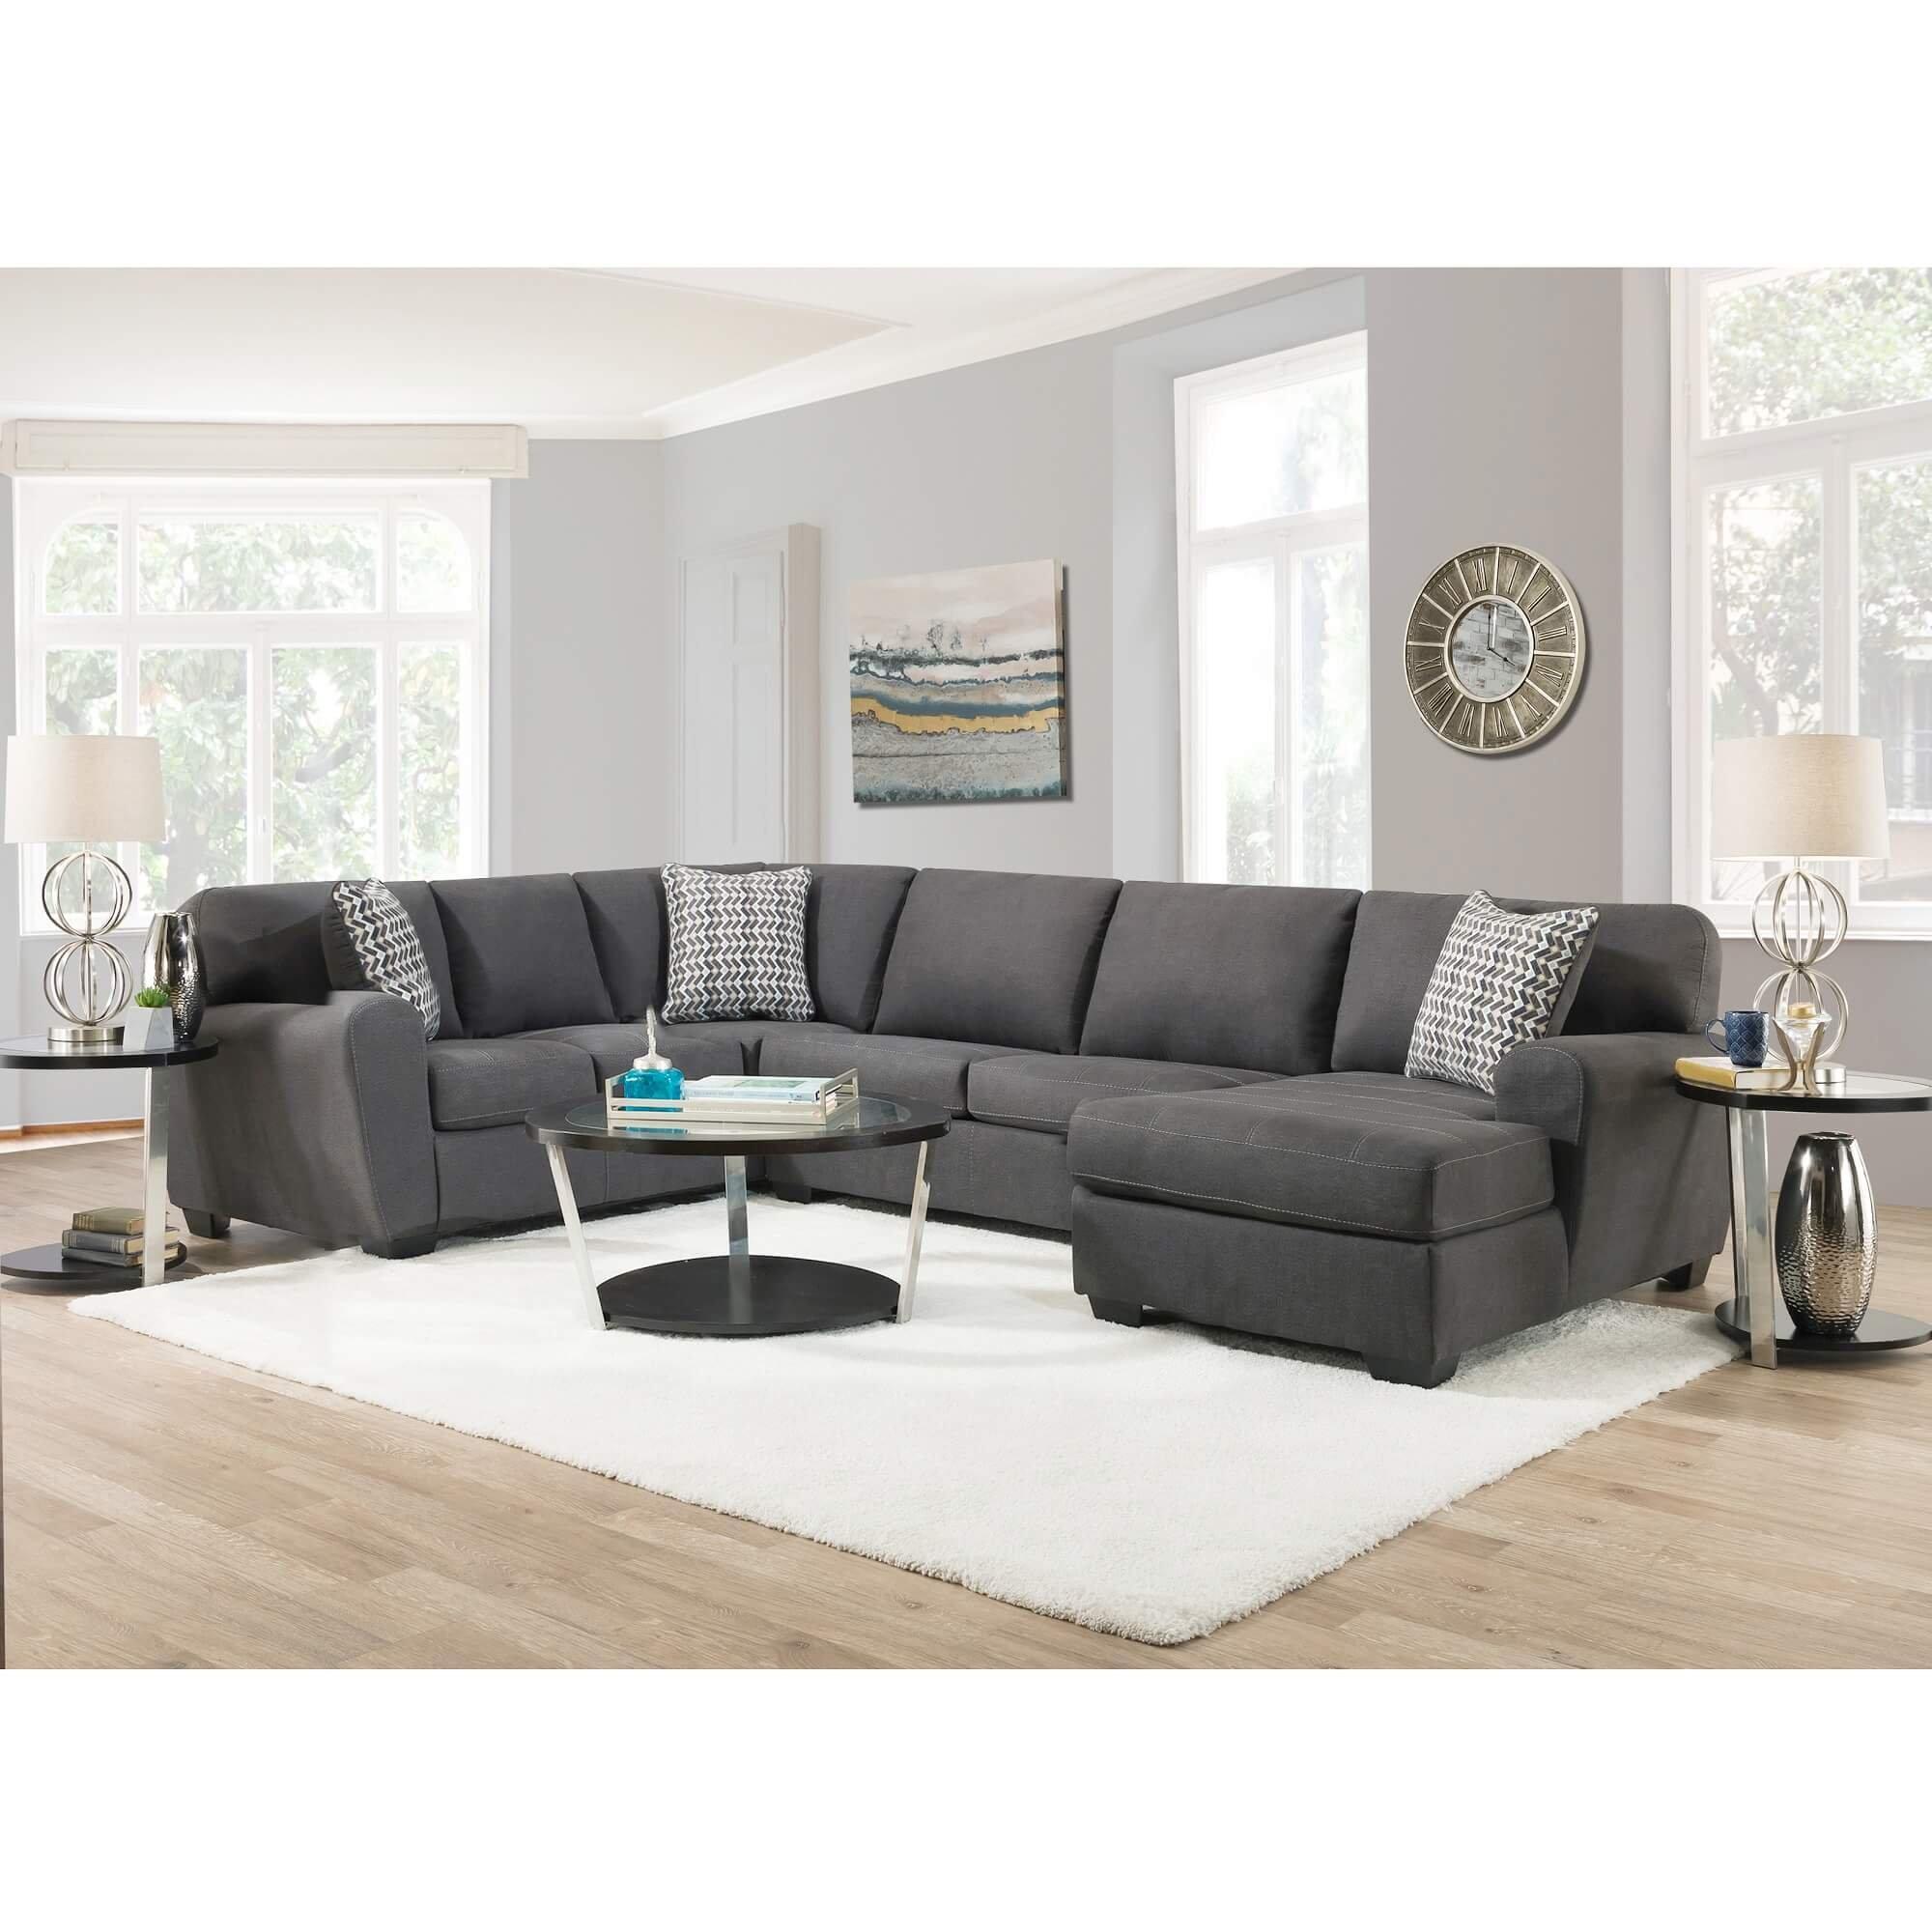 3 piece sorenton sectional living room collection